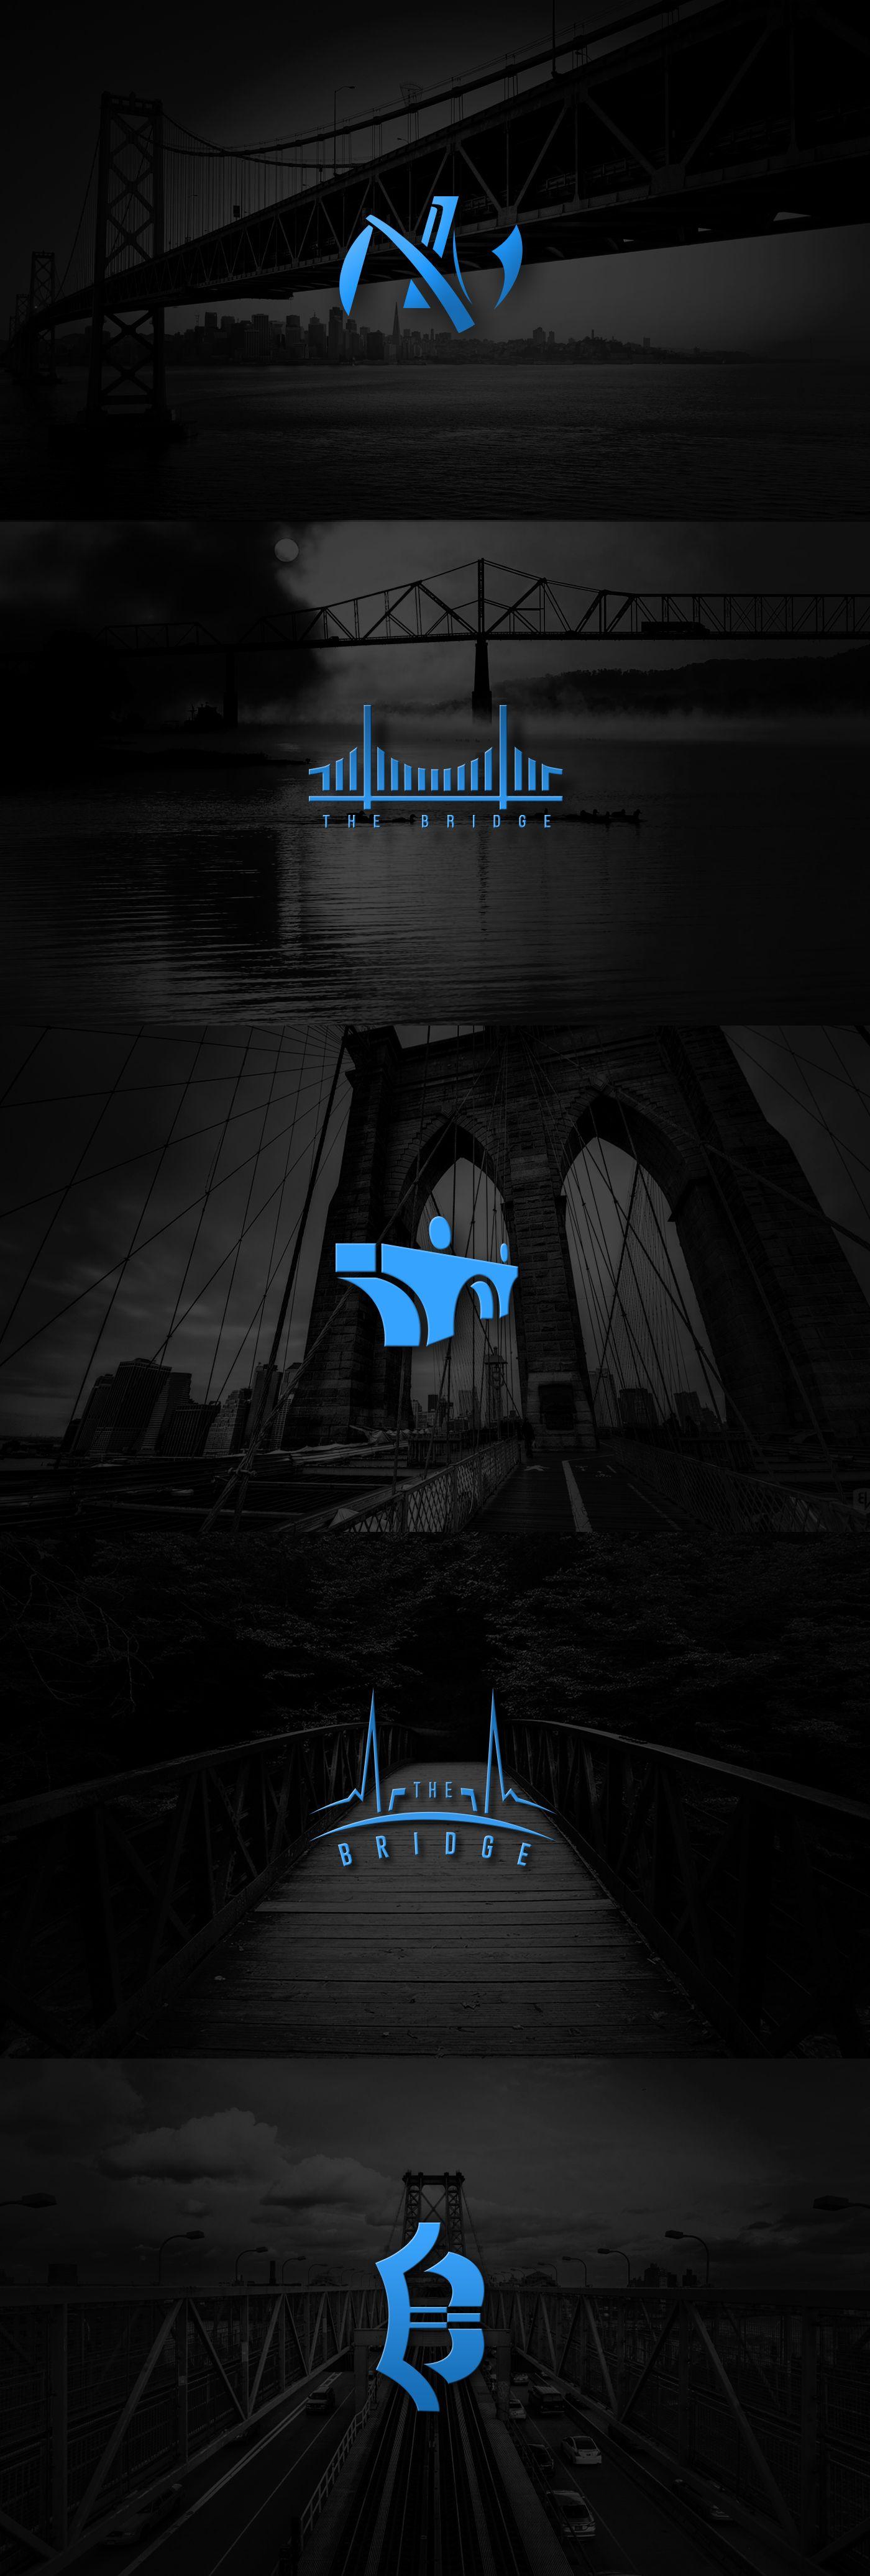 Cassandra cappello graphic design toronto - The Bridge Logo Concepts On Behance